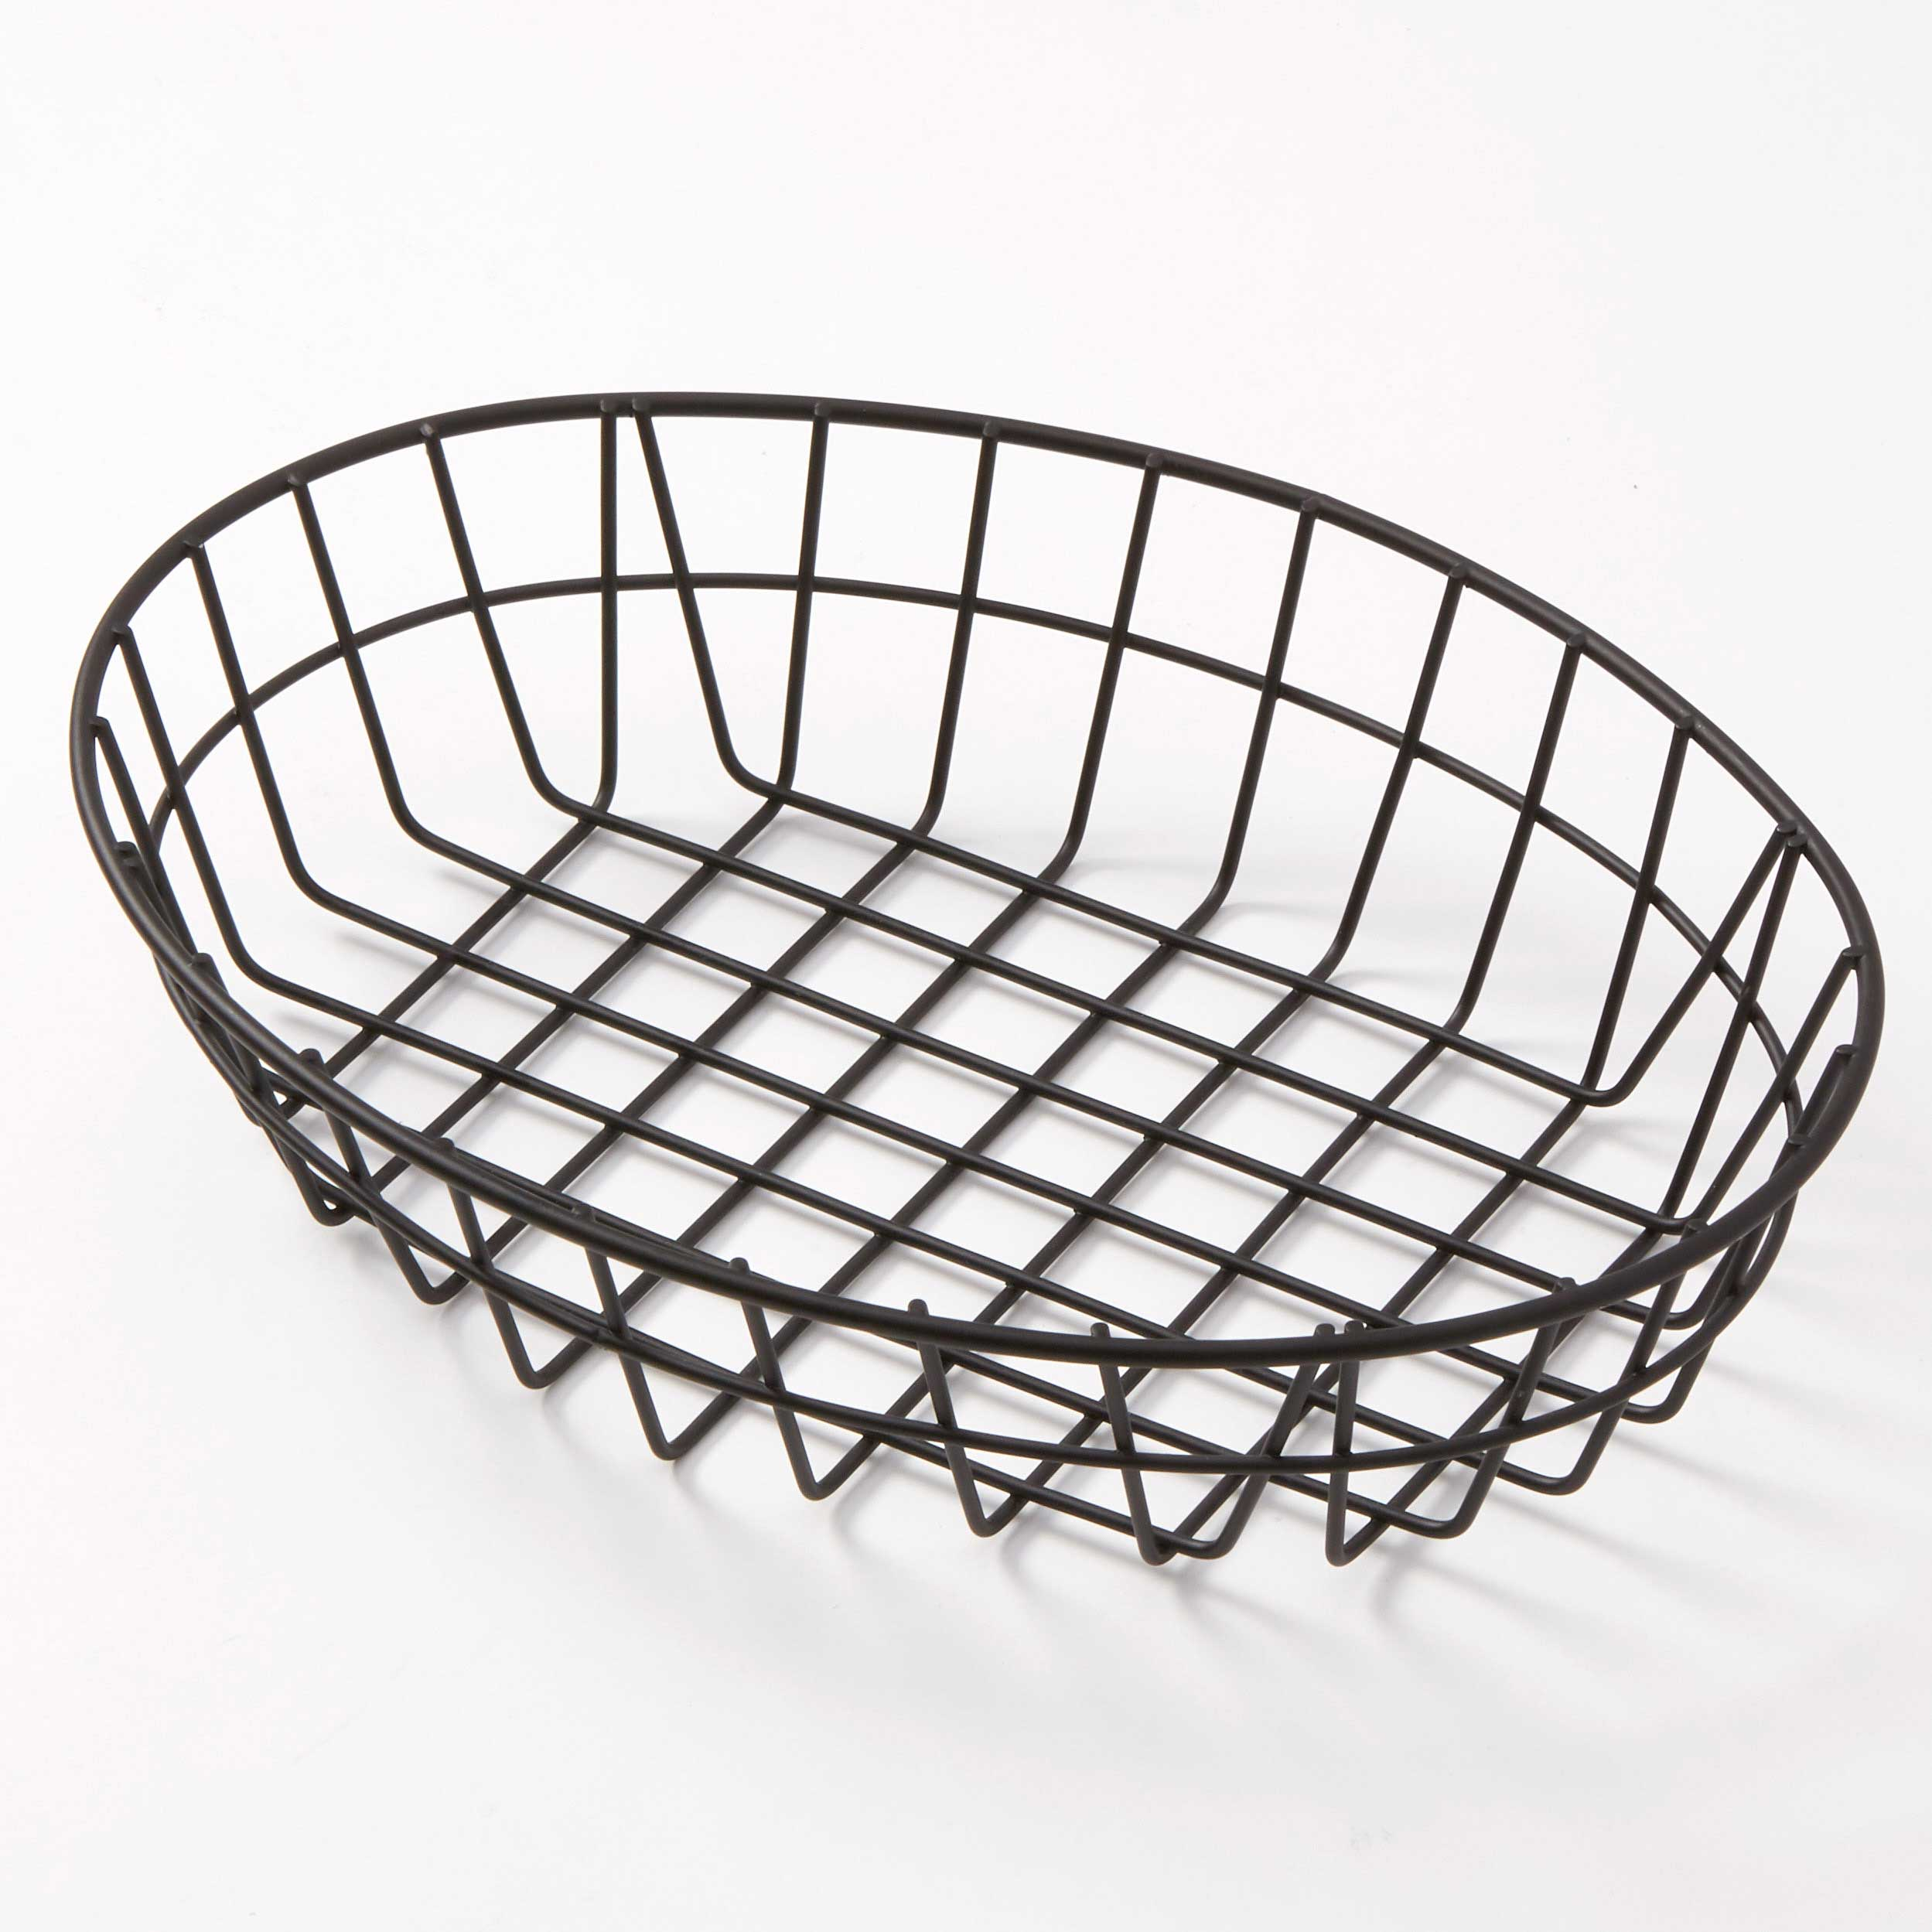 American Metalcraft GOVB811 basket, tabletop, metal